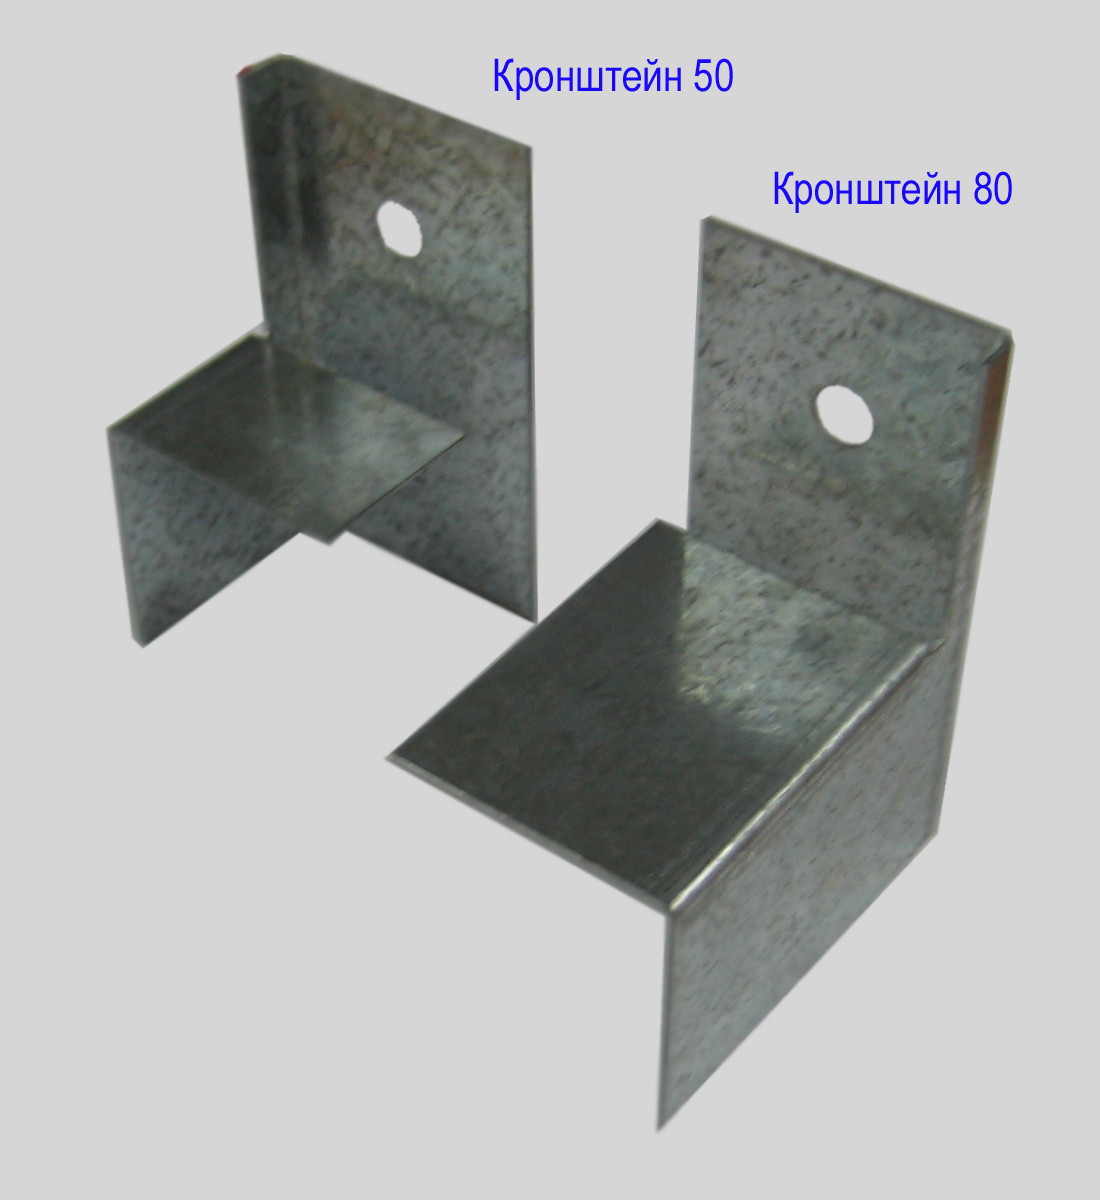 Кронштейн оцинкованный КР-120, тол. 1,4 мм